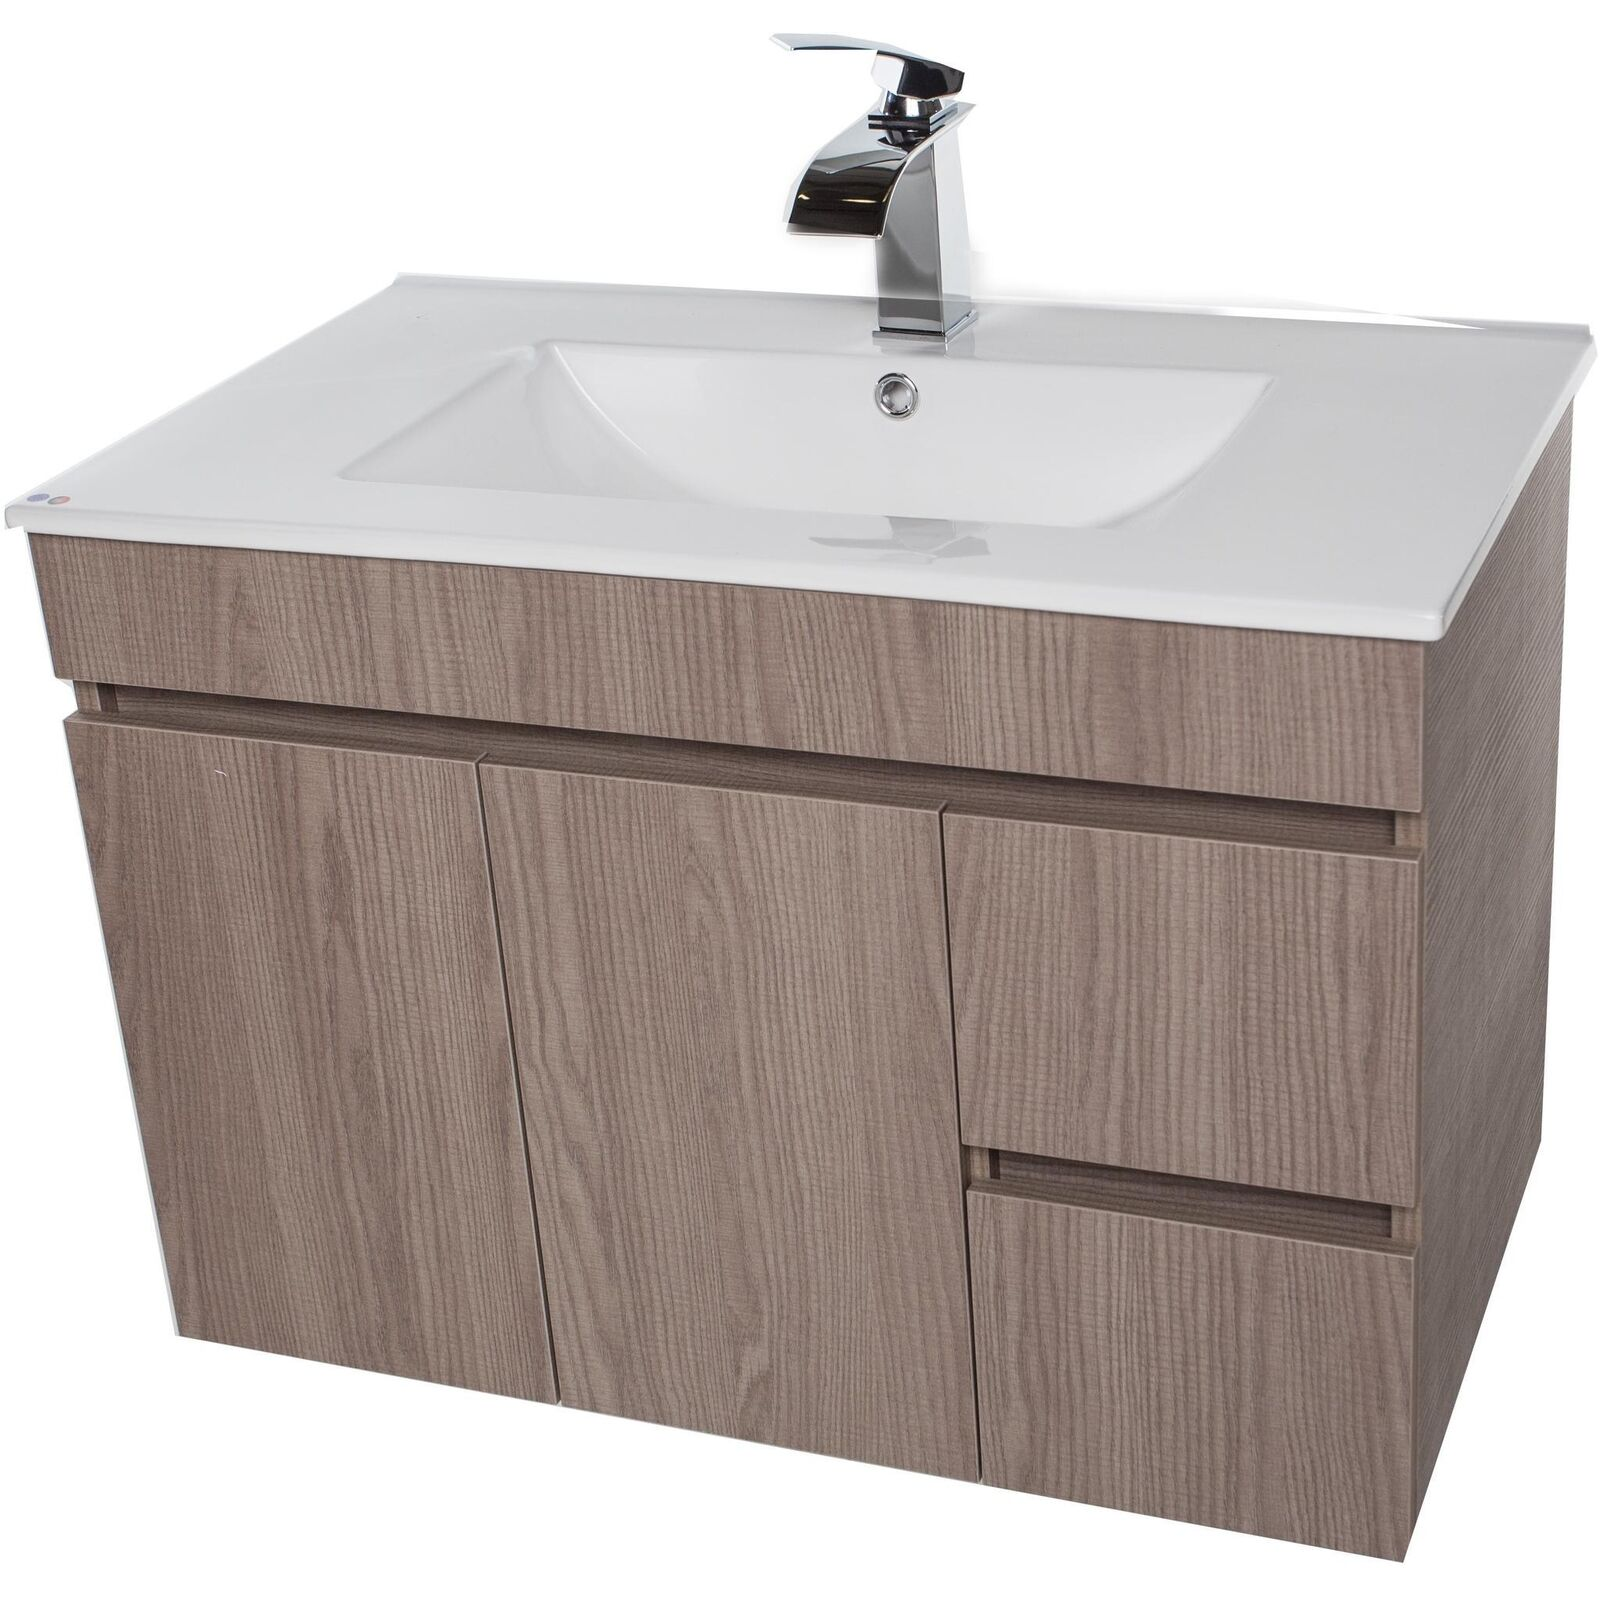 Wall Mount Bath Vanity.Strato Wall Mounted Bathroom Vanity Cabinet Set Bath Furniture With Single Sink